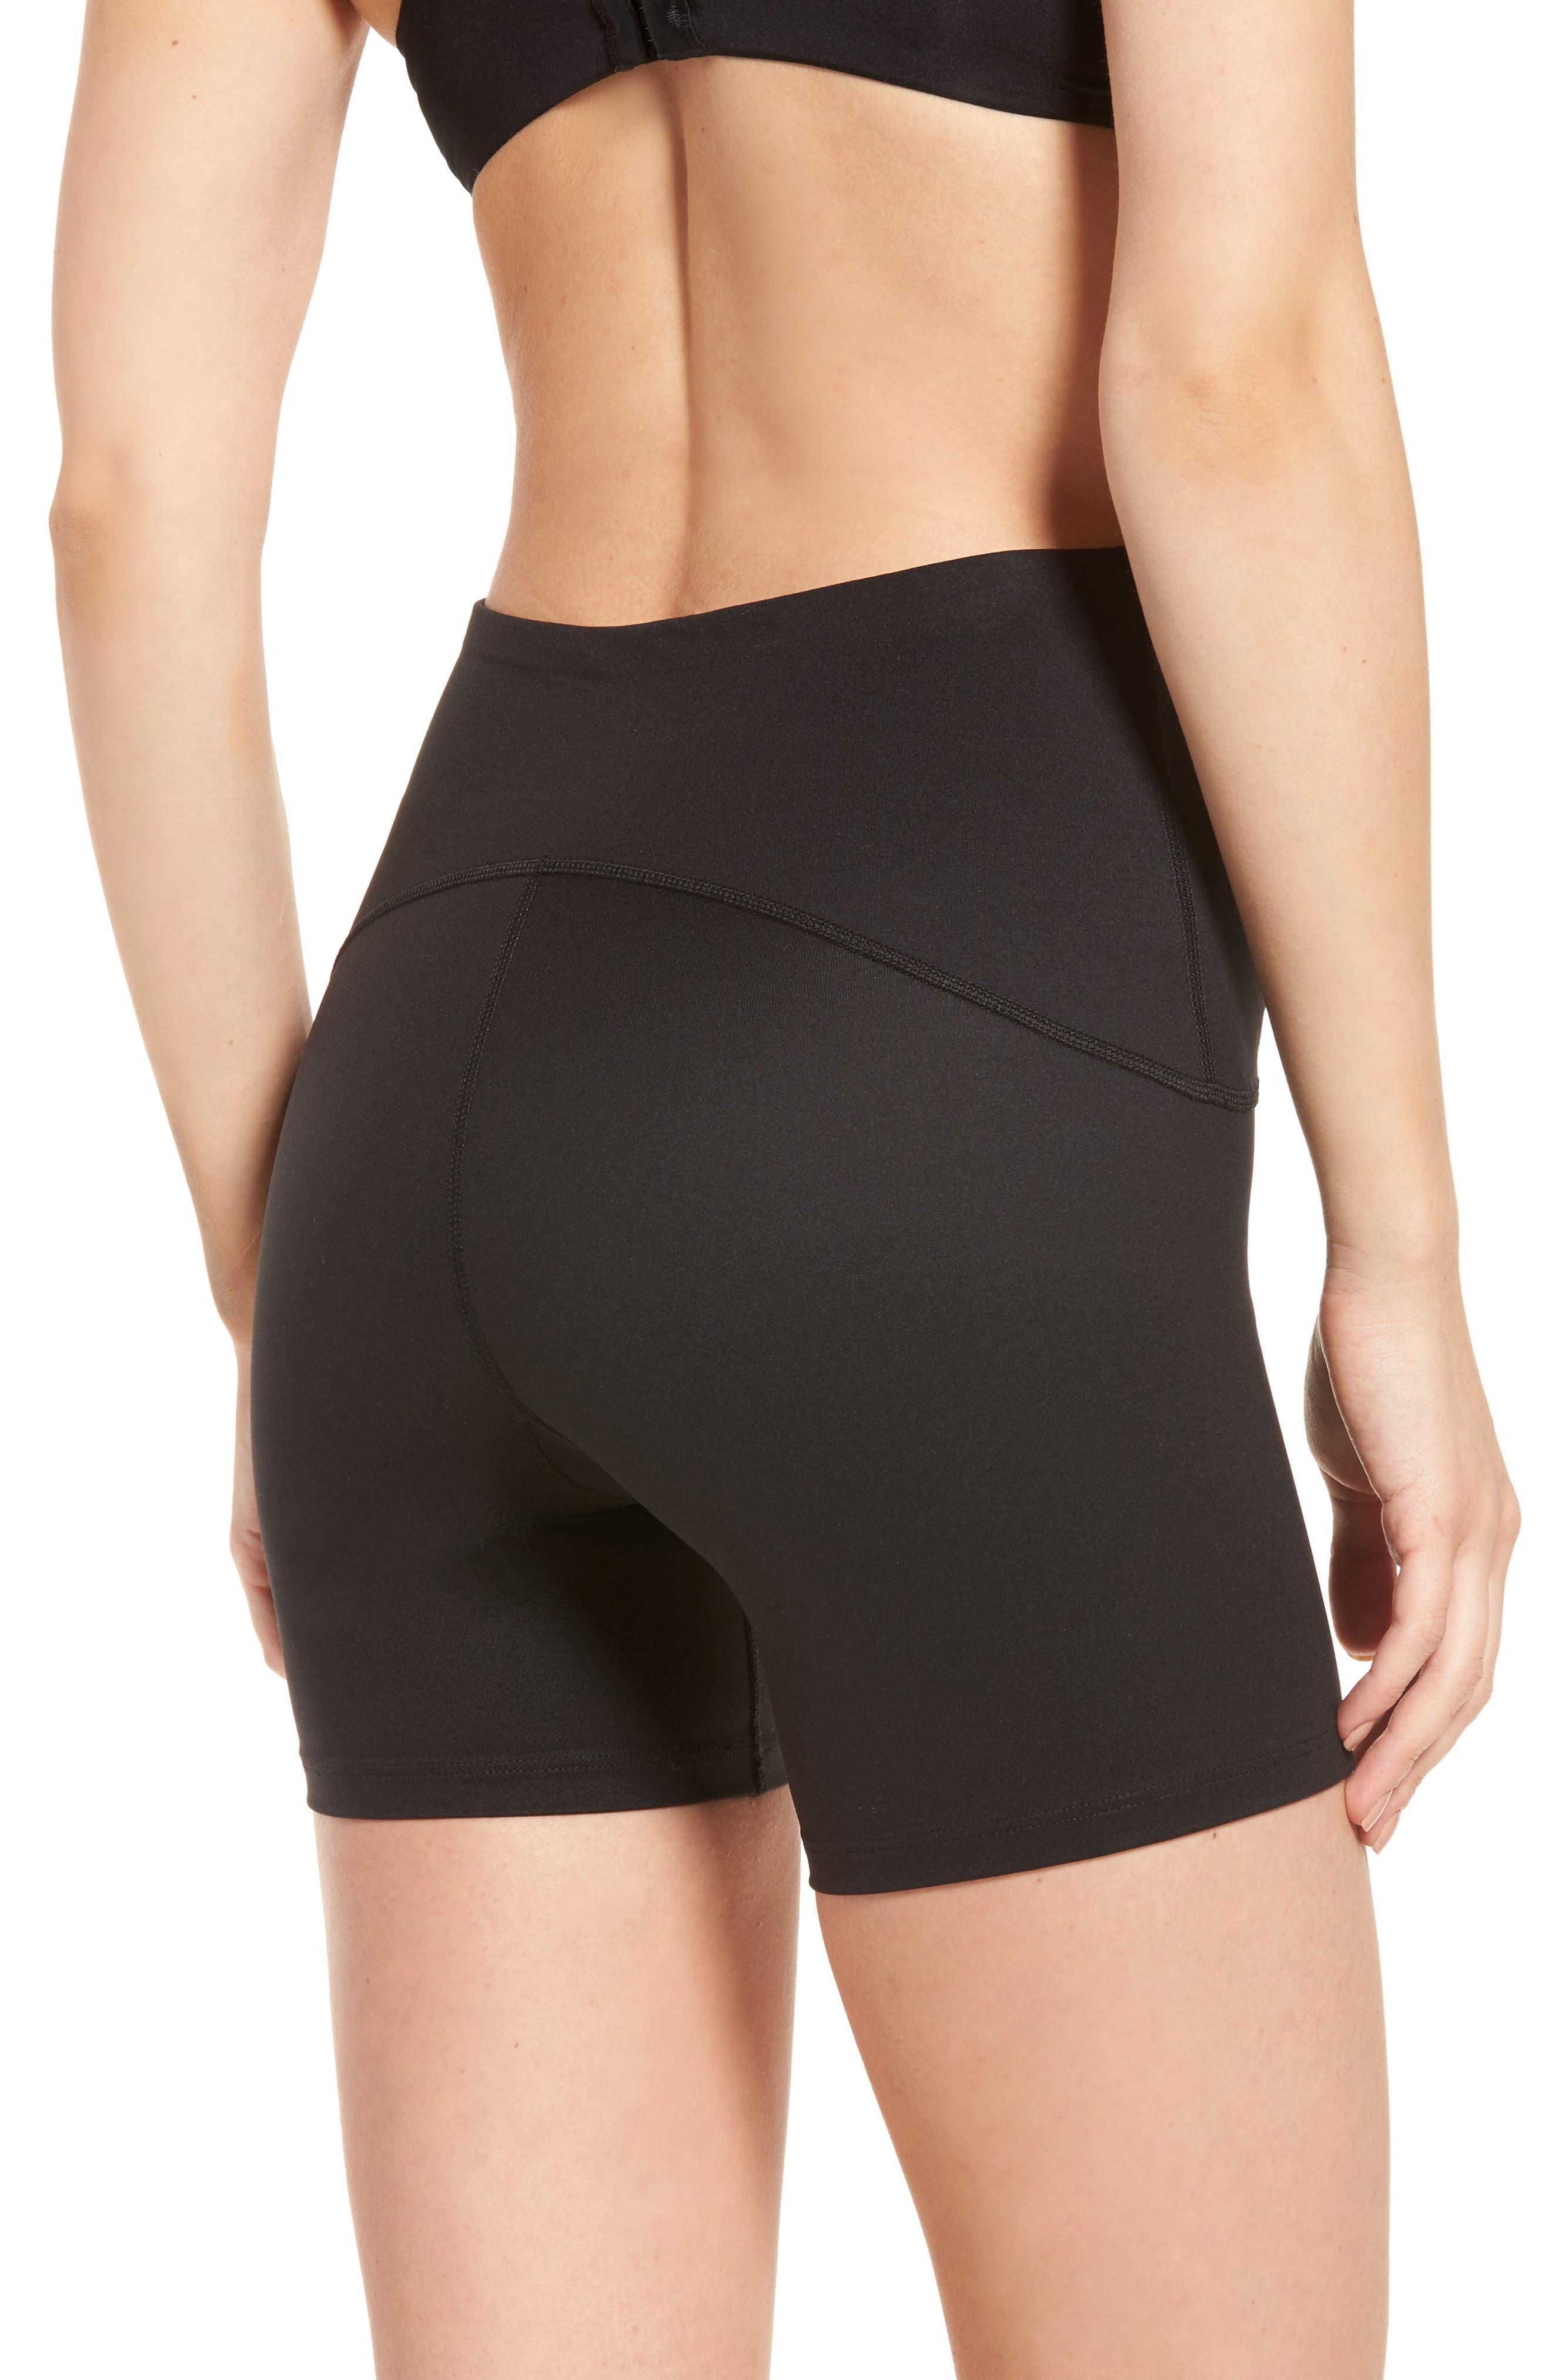 Sport Compression Shorts,                             Alternate thumbnail 2, color,                             Black